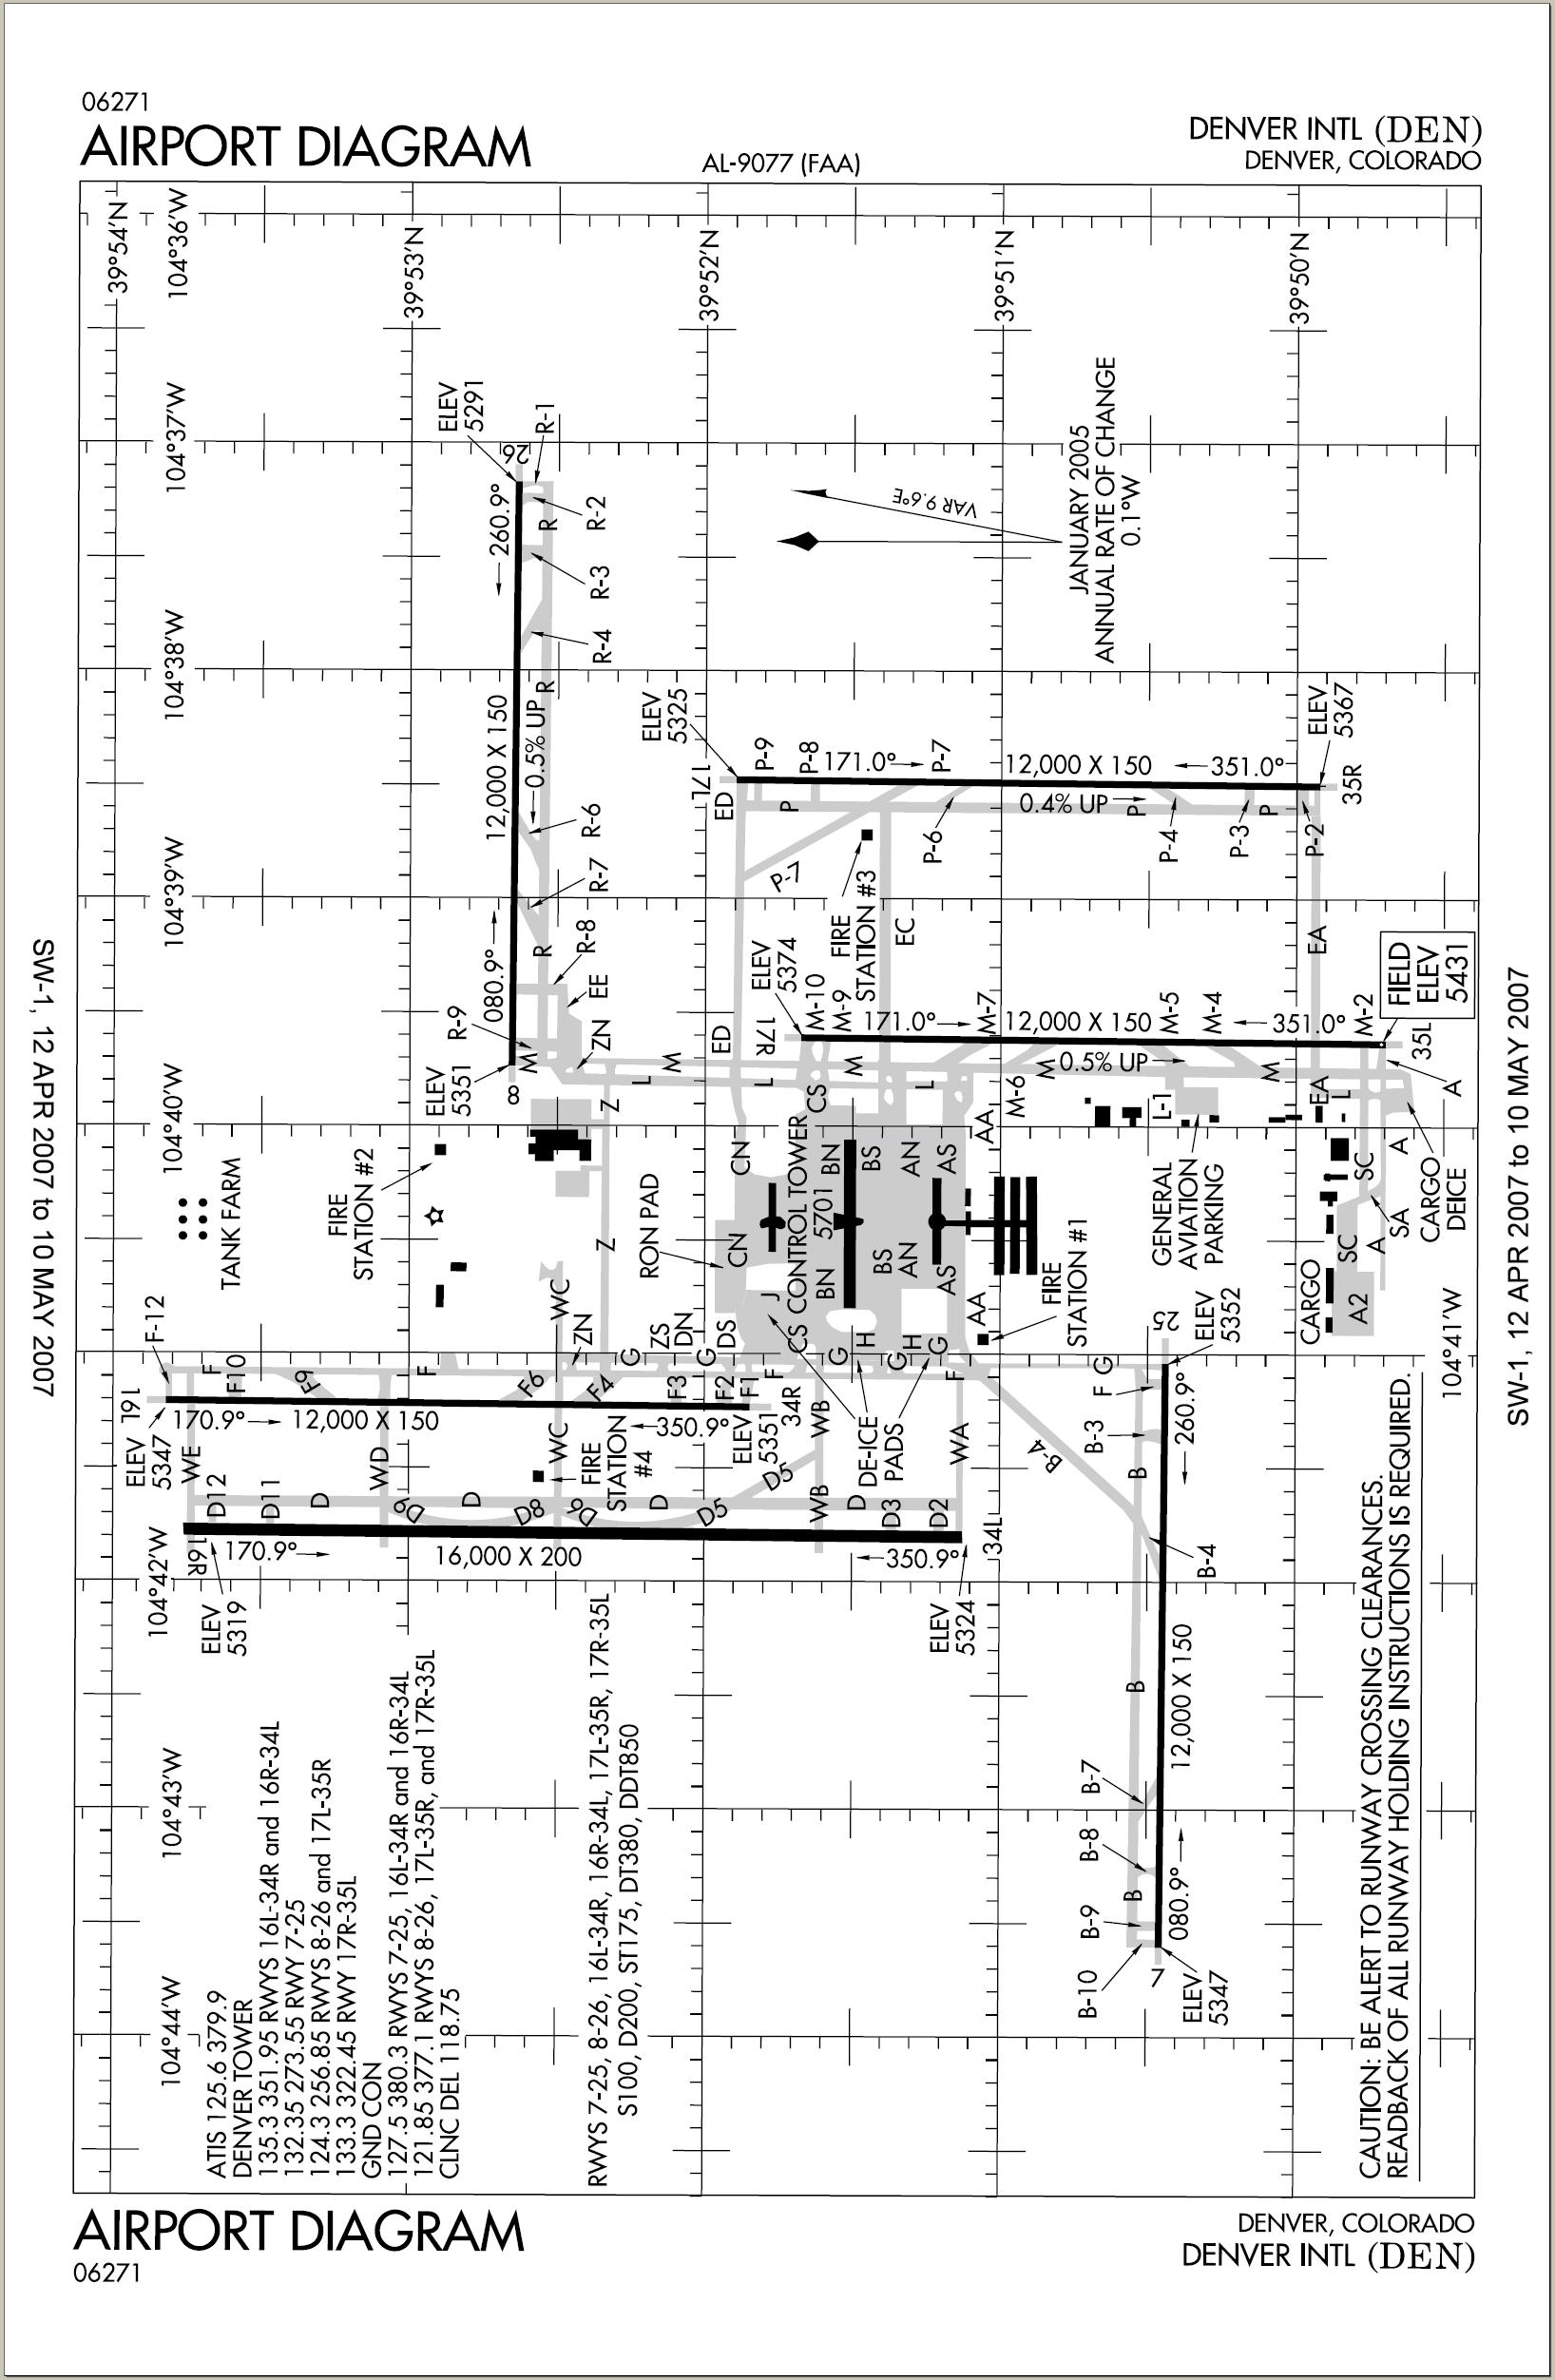 1000 images about us denver co on pinterest warfare denver  : denver airport diagram - findchart.co